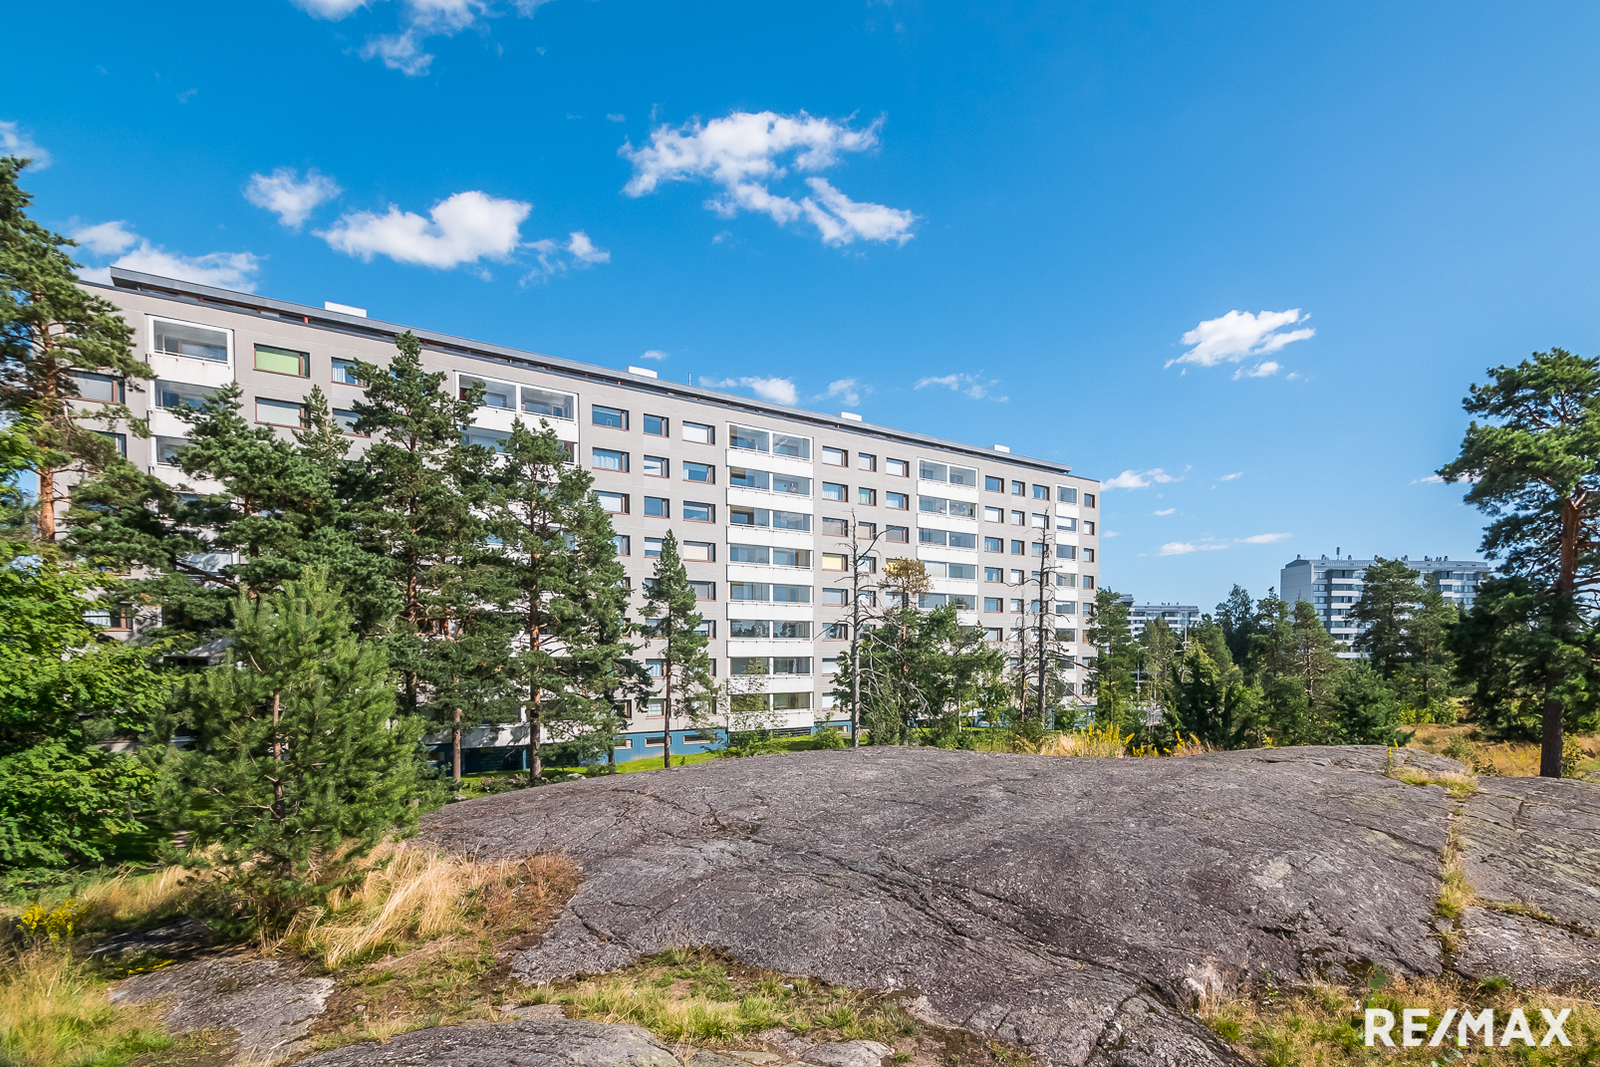 Kontula, Helsinki